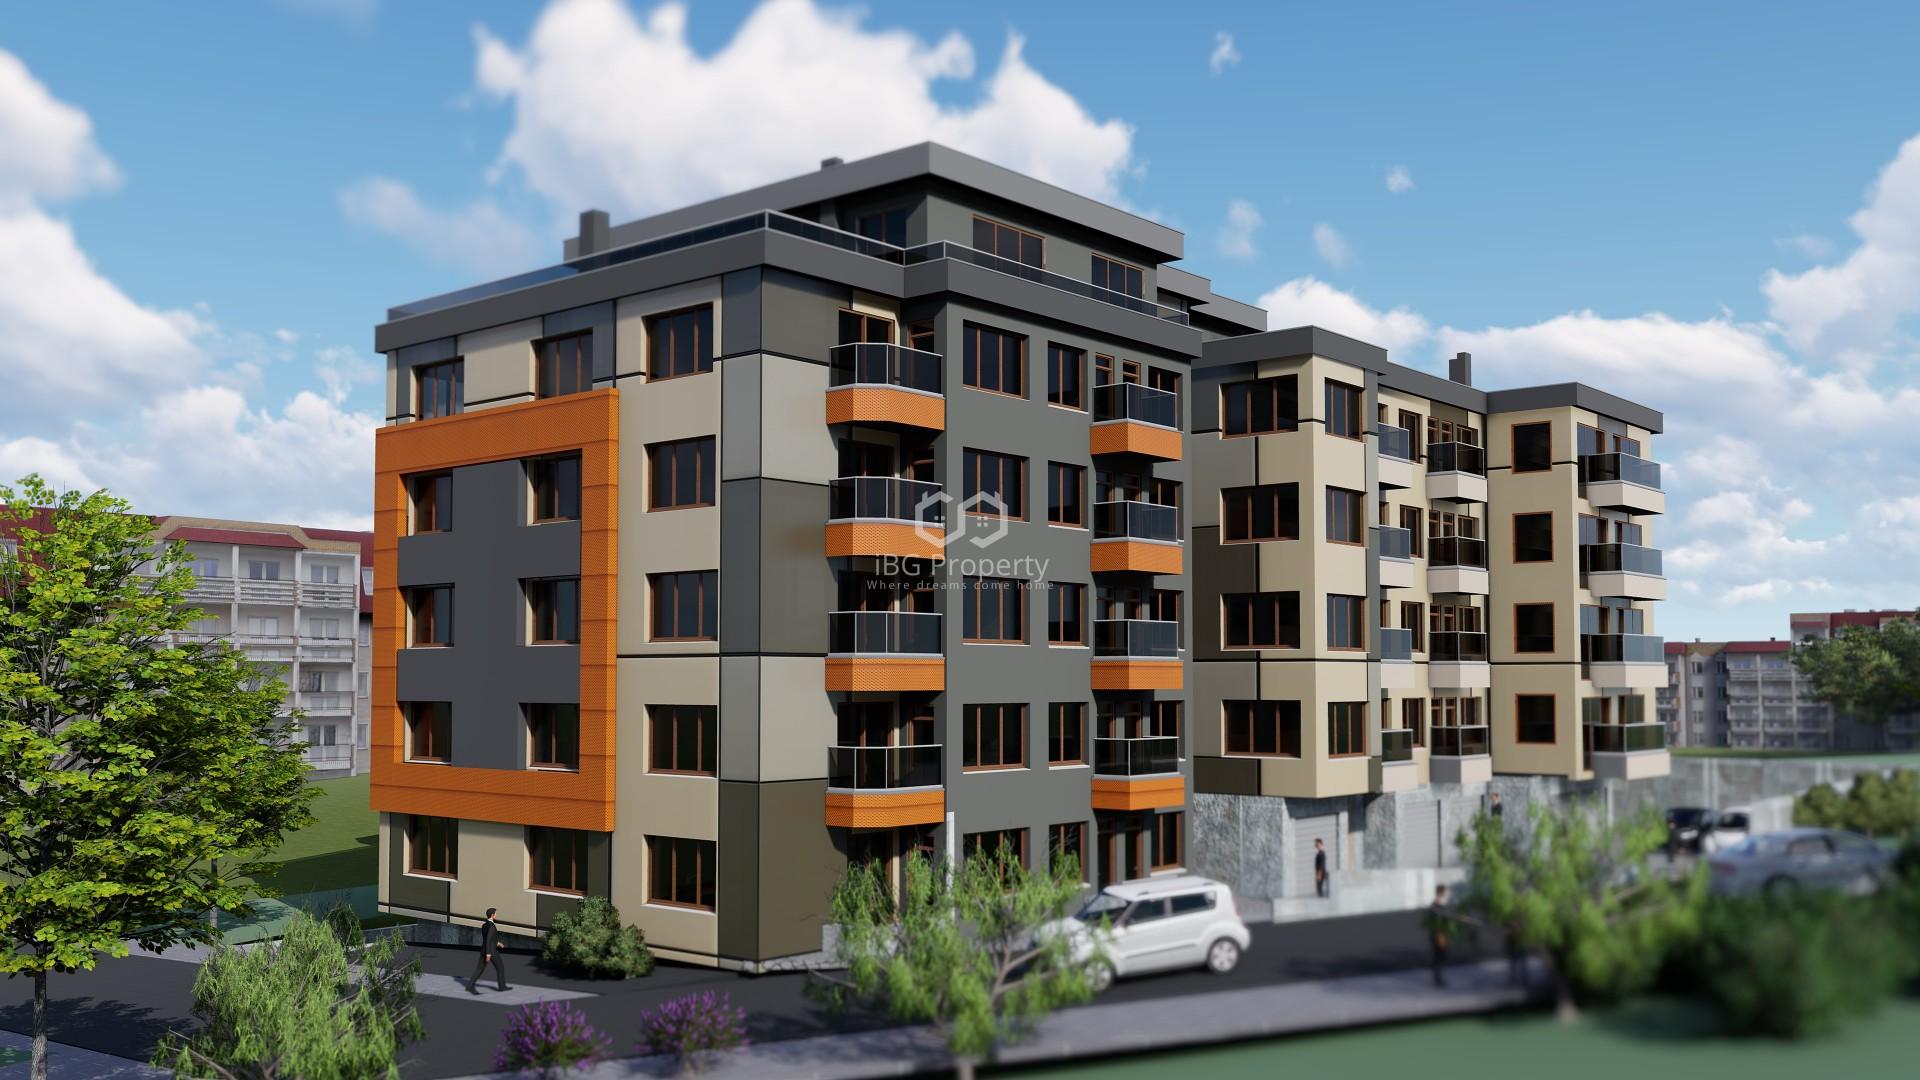 Тристаен апартамент Кайсиева градина Варна 70 m2